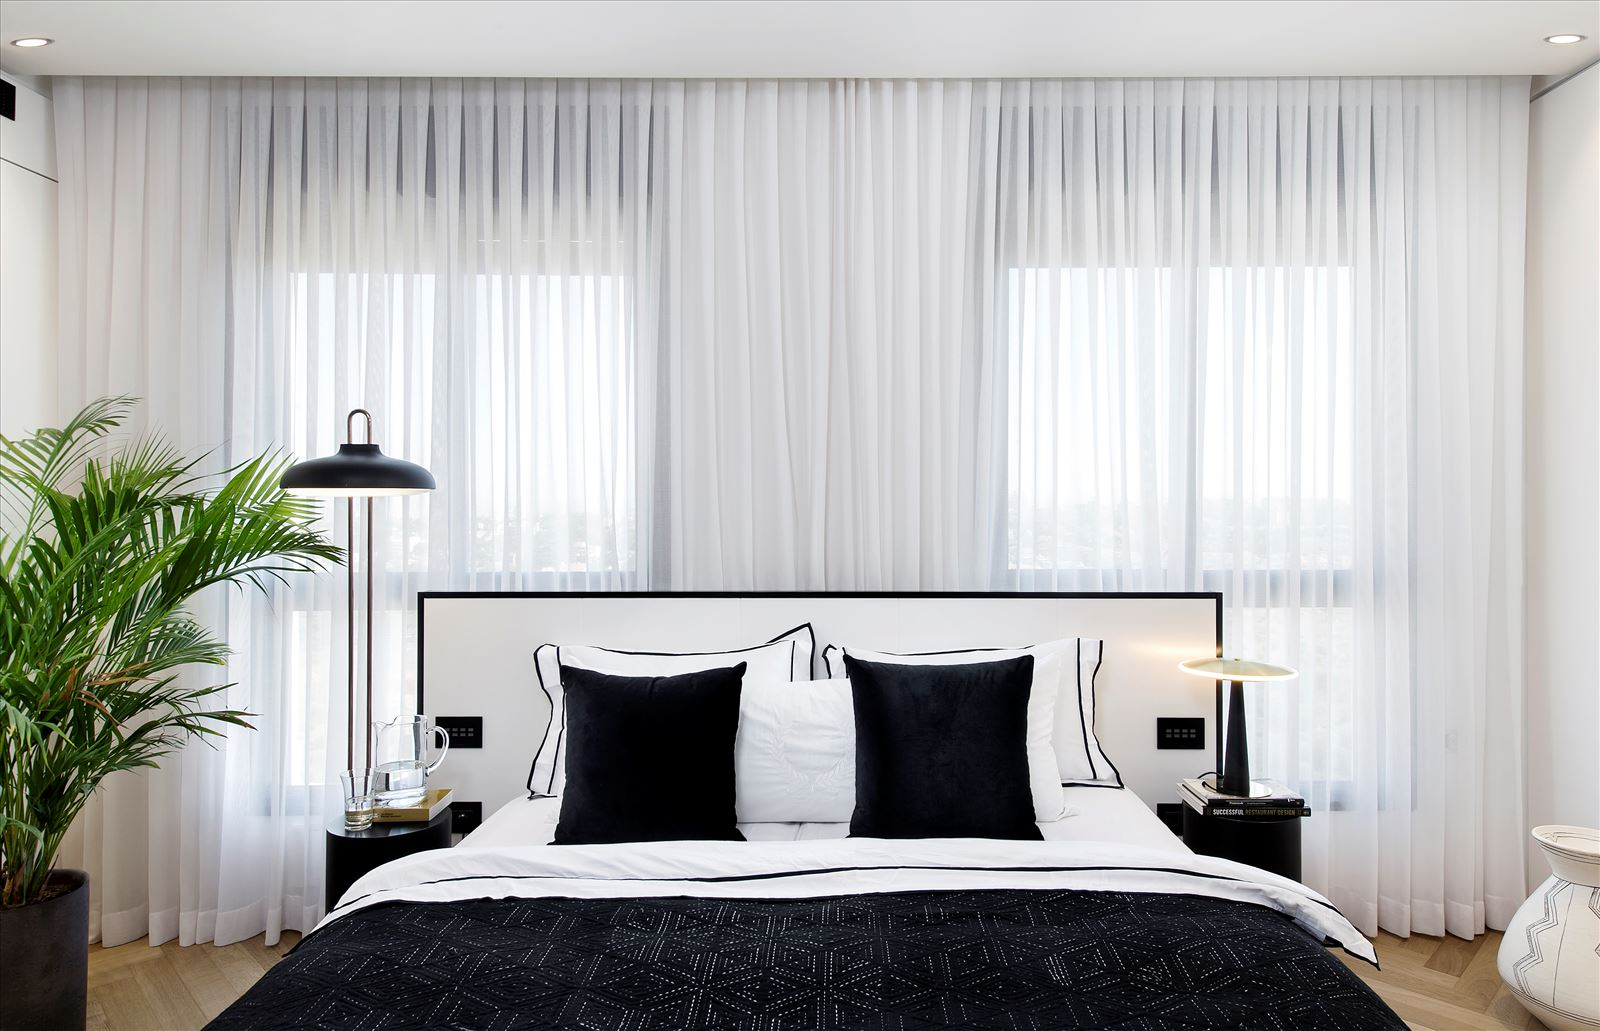 Penthouse - Petah Tikva גופי תאורה בצידי מיטת השינה נעשה על ידי דורי קמחי